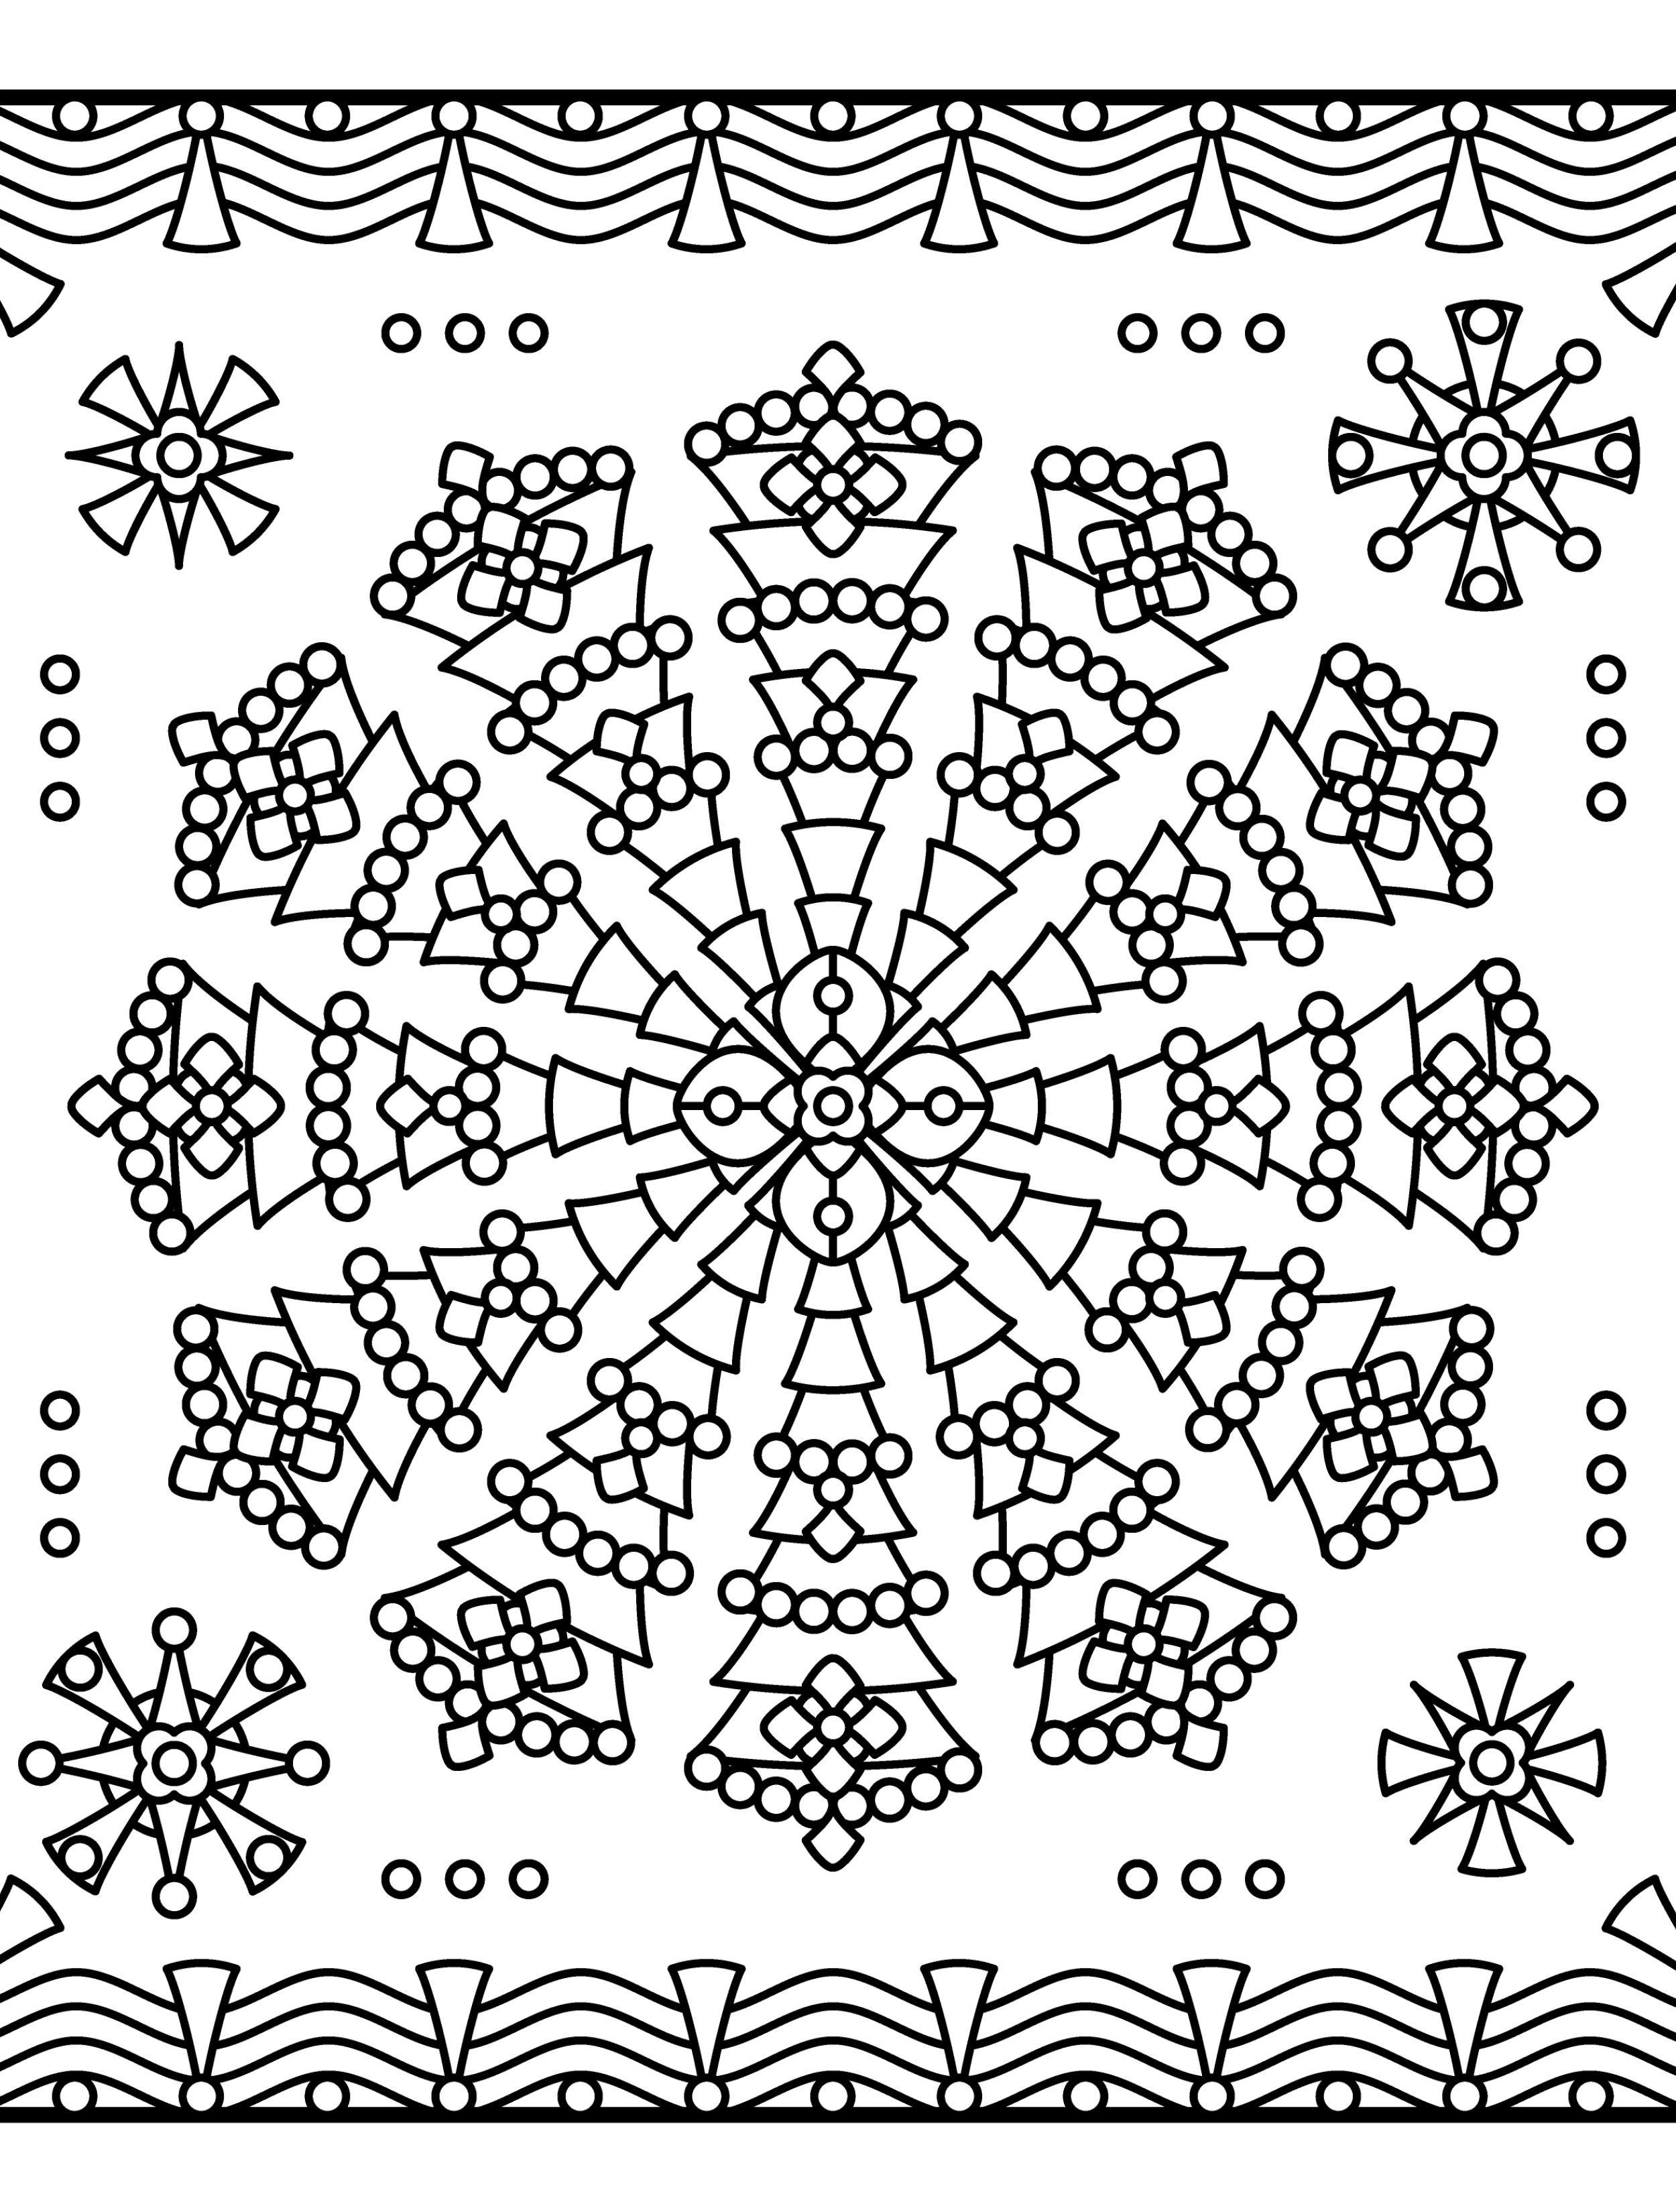 Pin de Lakshmi Dinesh en Bujo | Pinterest | Mandalas